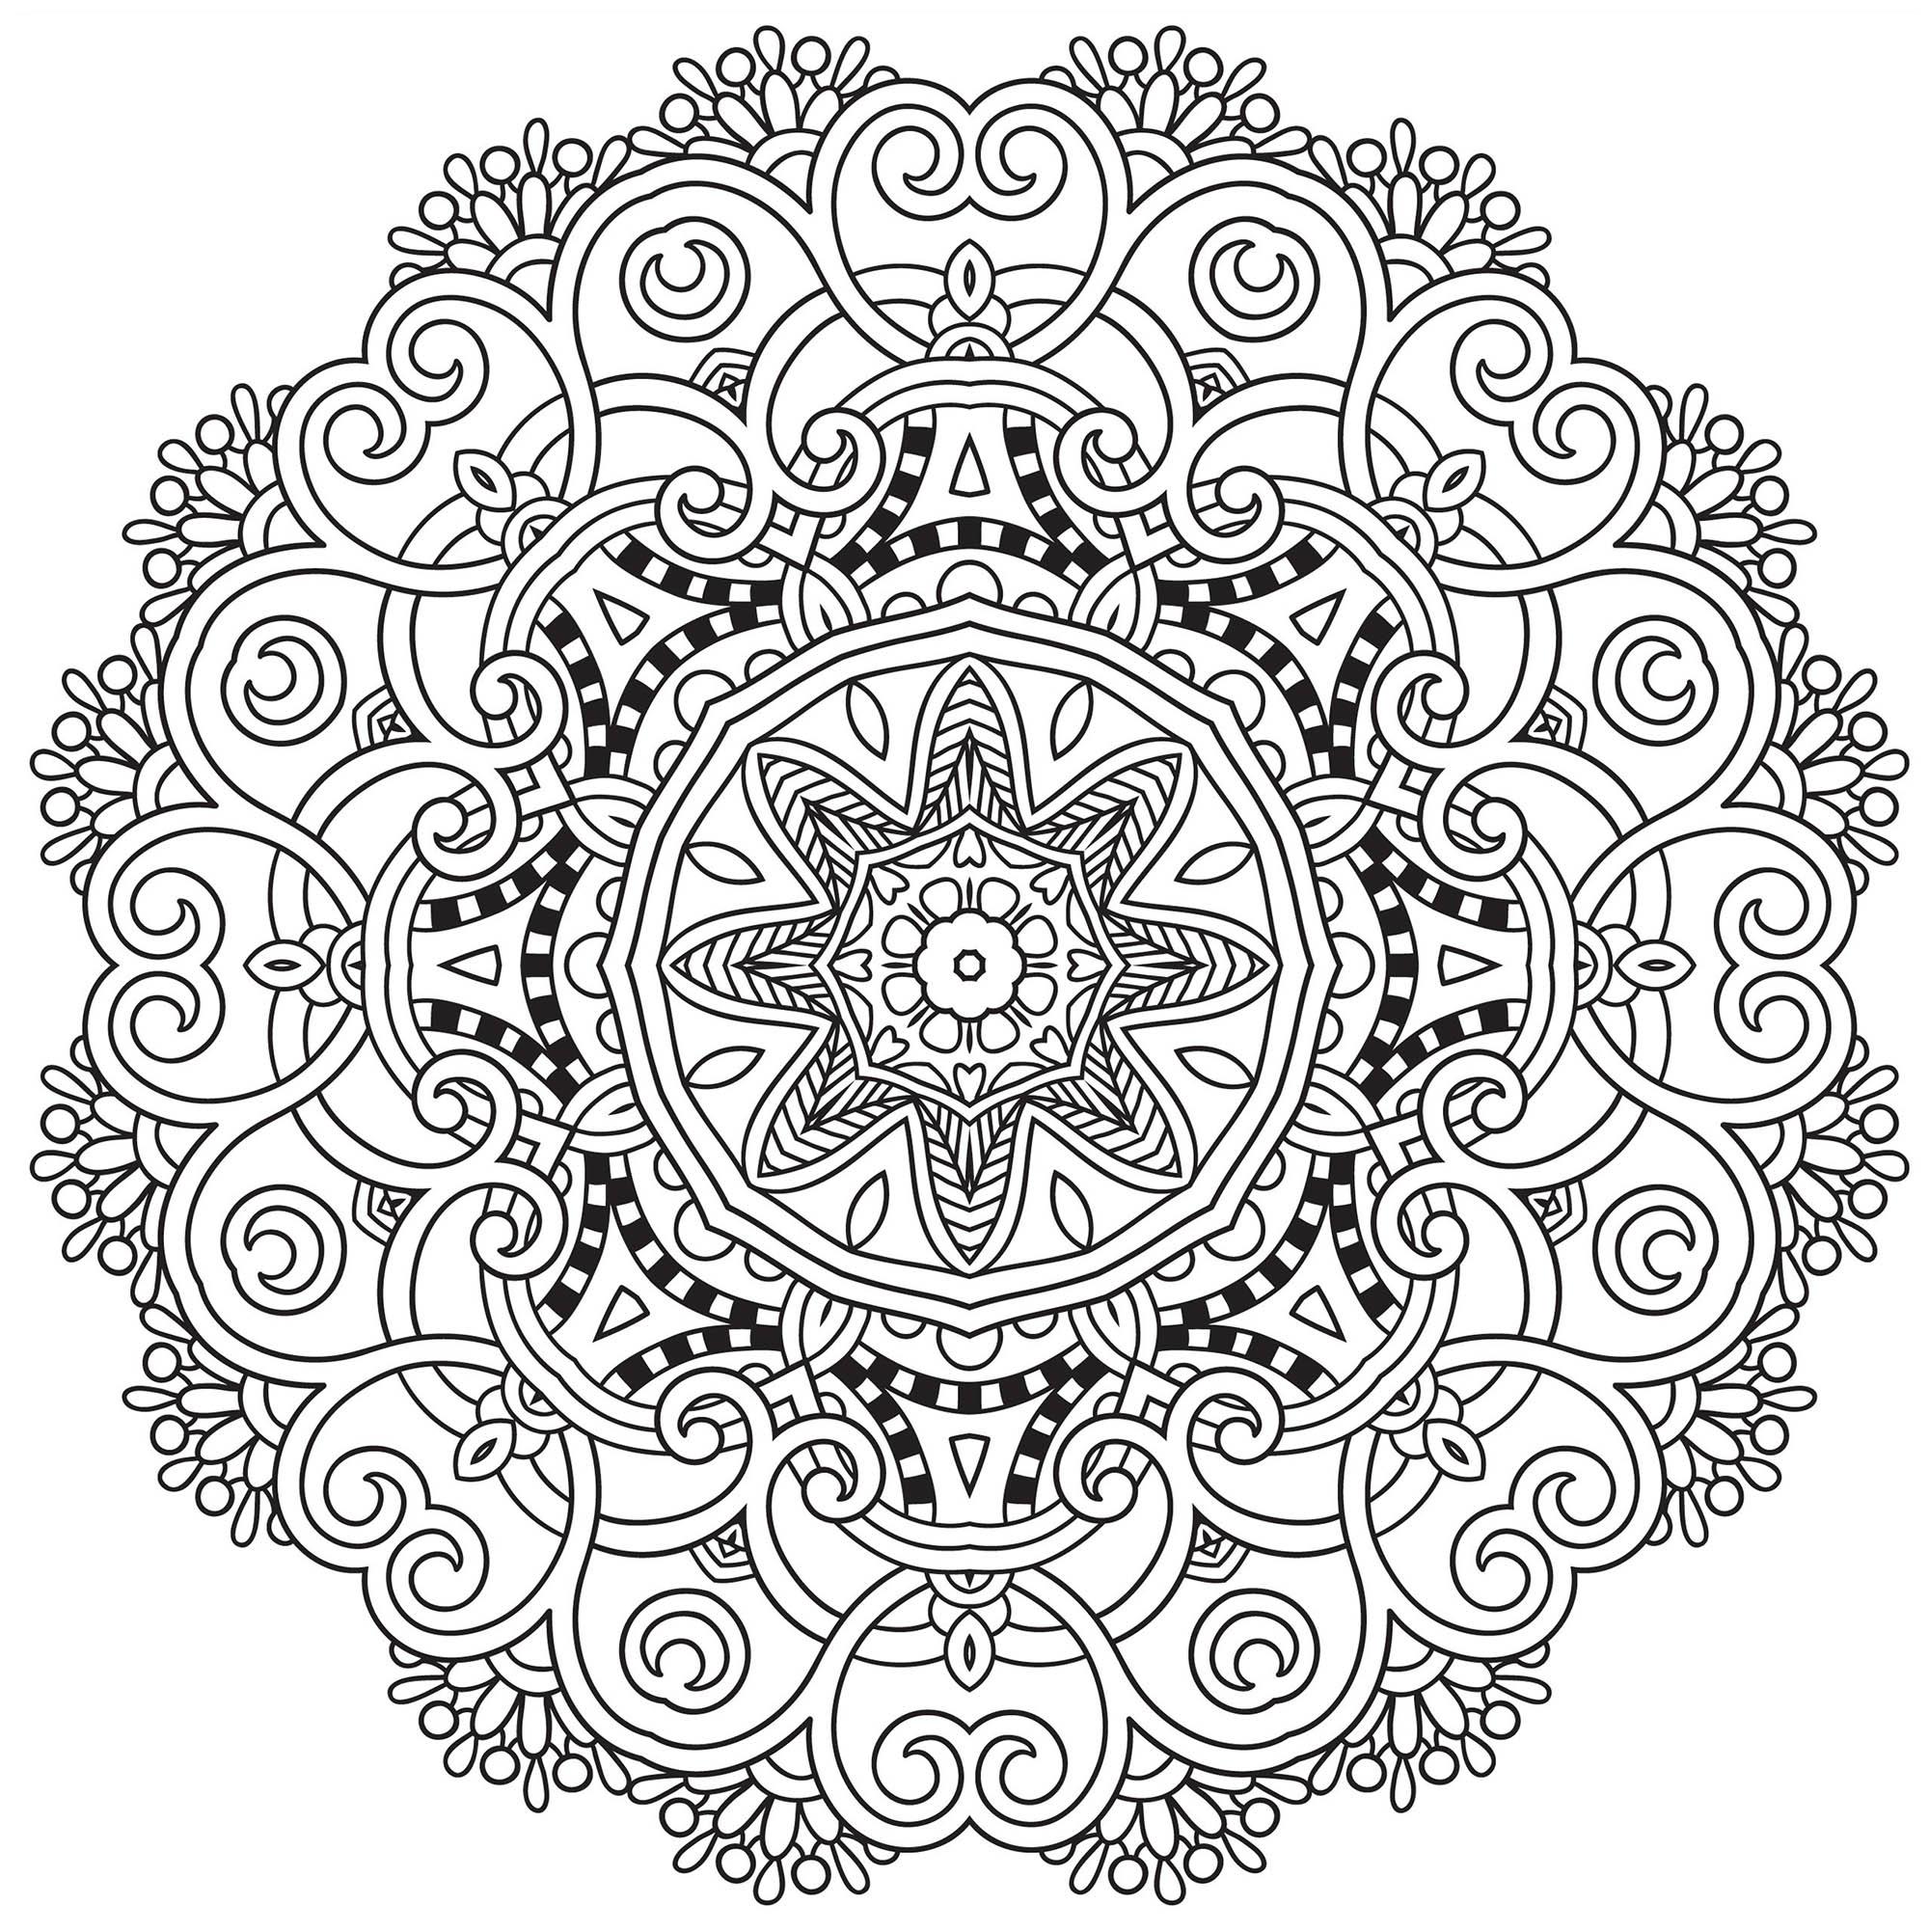 2000x2003 Incredible Mandala To Download In Pdf Mandalas With Flowers